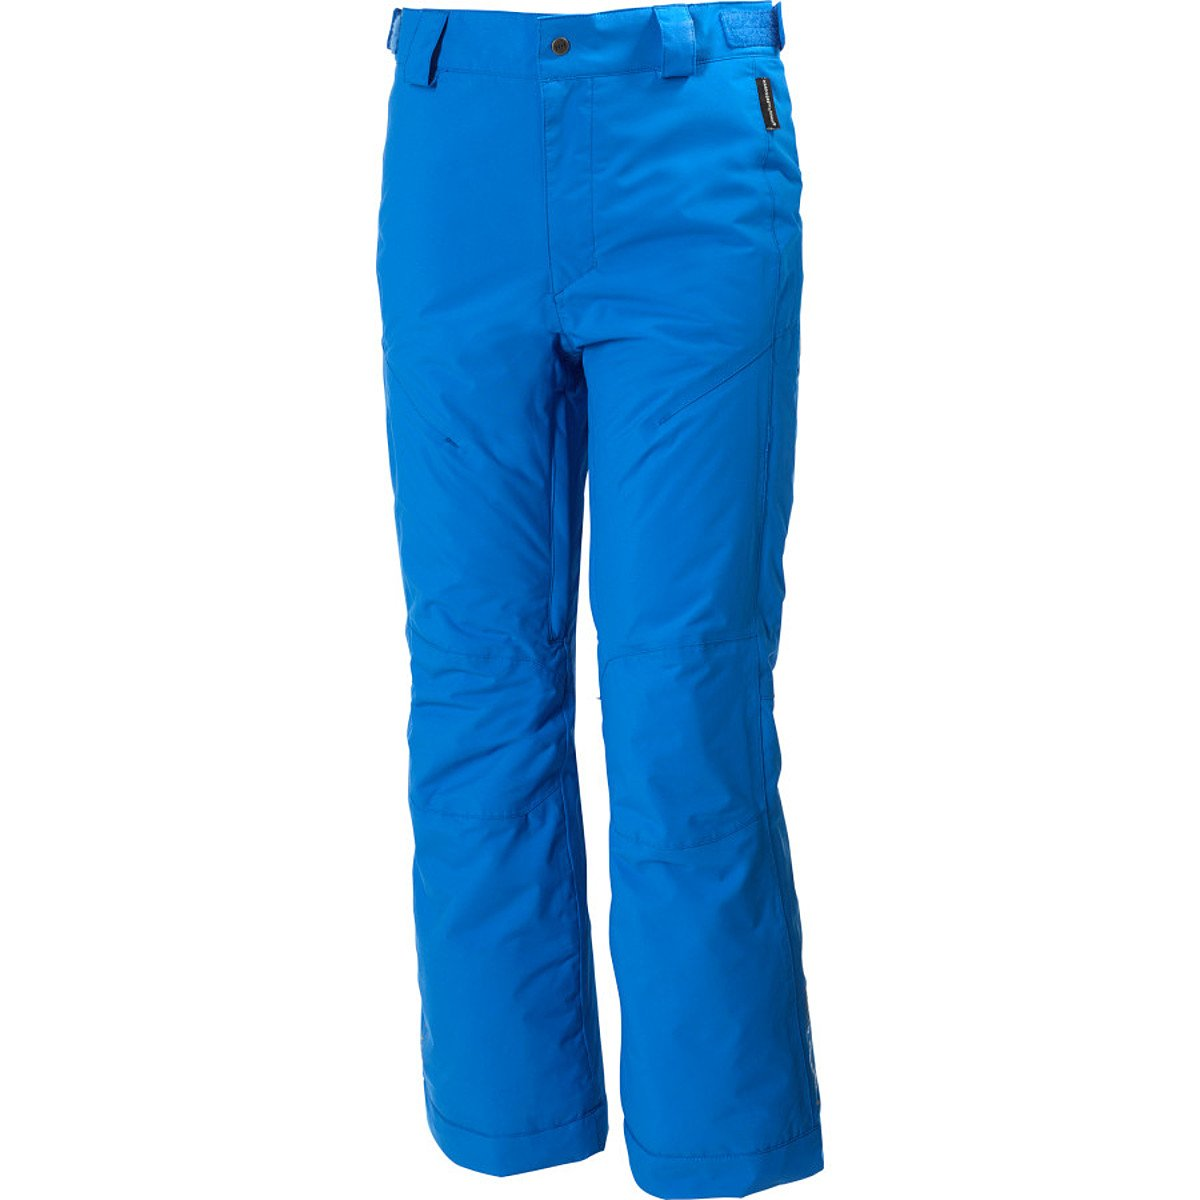 Helly Hansen Junior Legend Pants, Racer Blue, 10